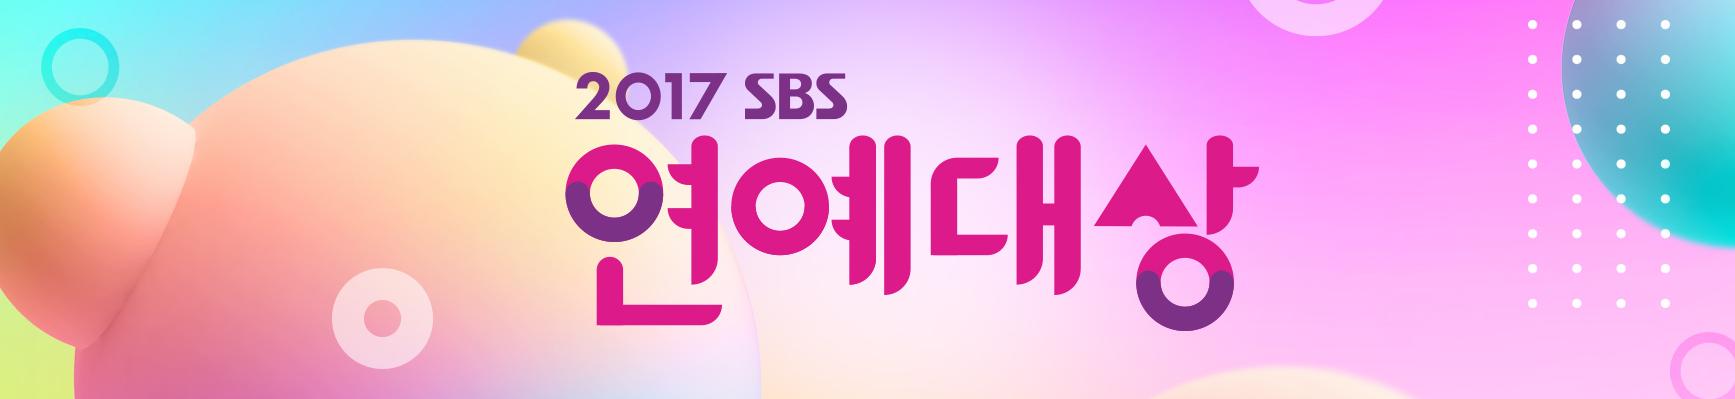 2017SBS演艺大赏